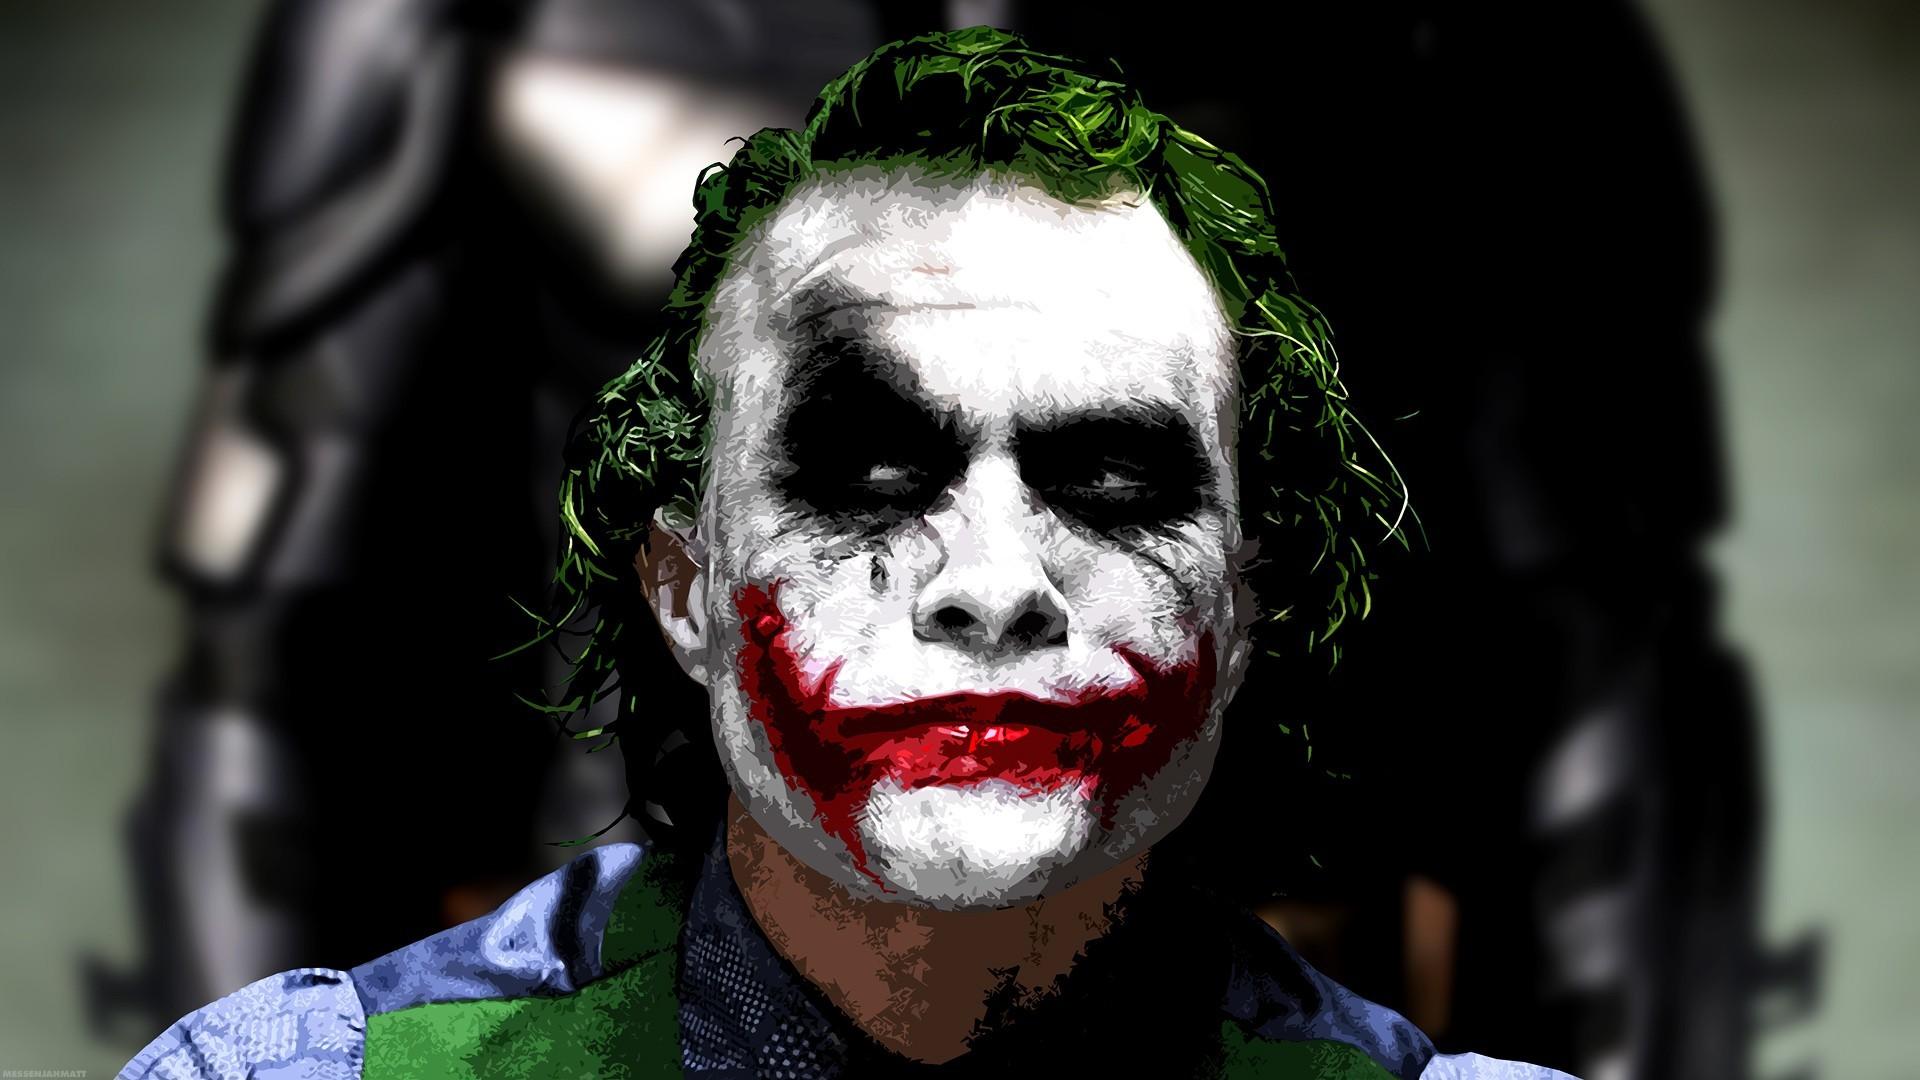 1920x1080 Best 25 Heath Ledger Joker Wallpaper Ideas Only On Pinterest